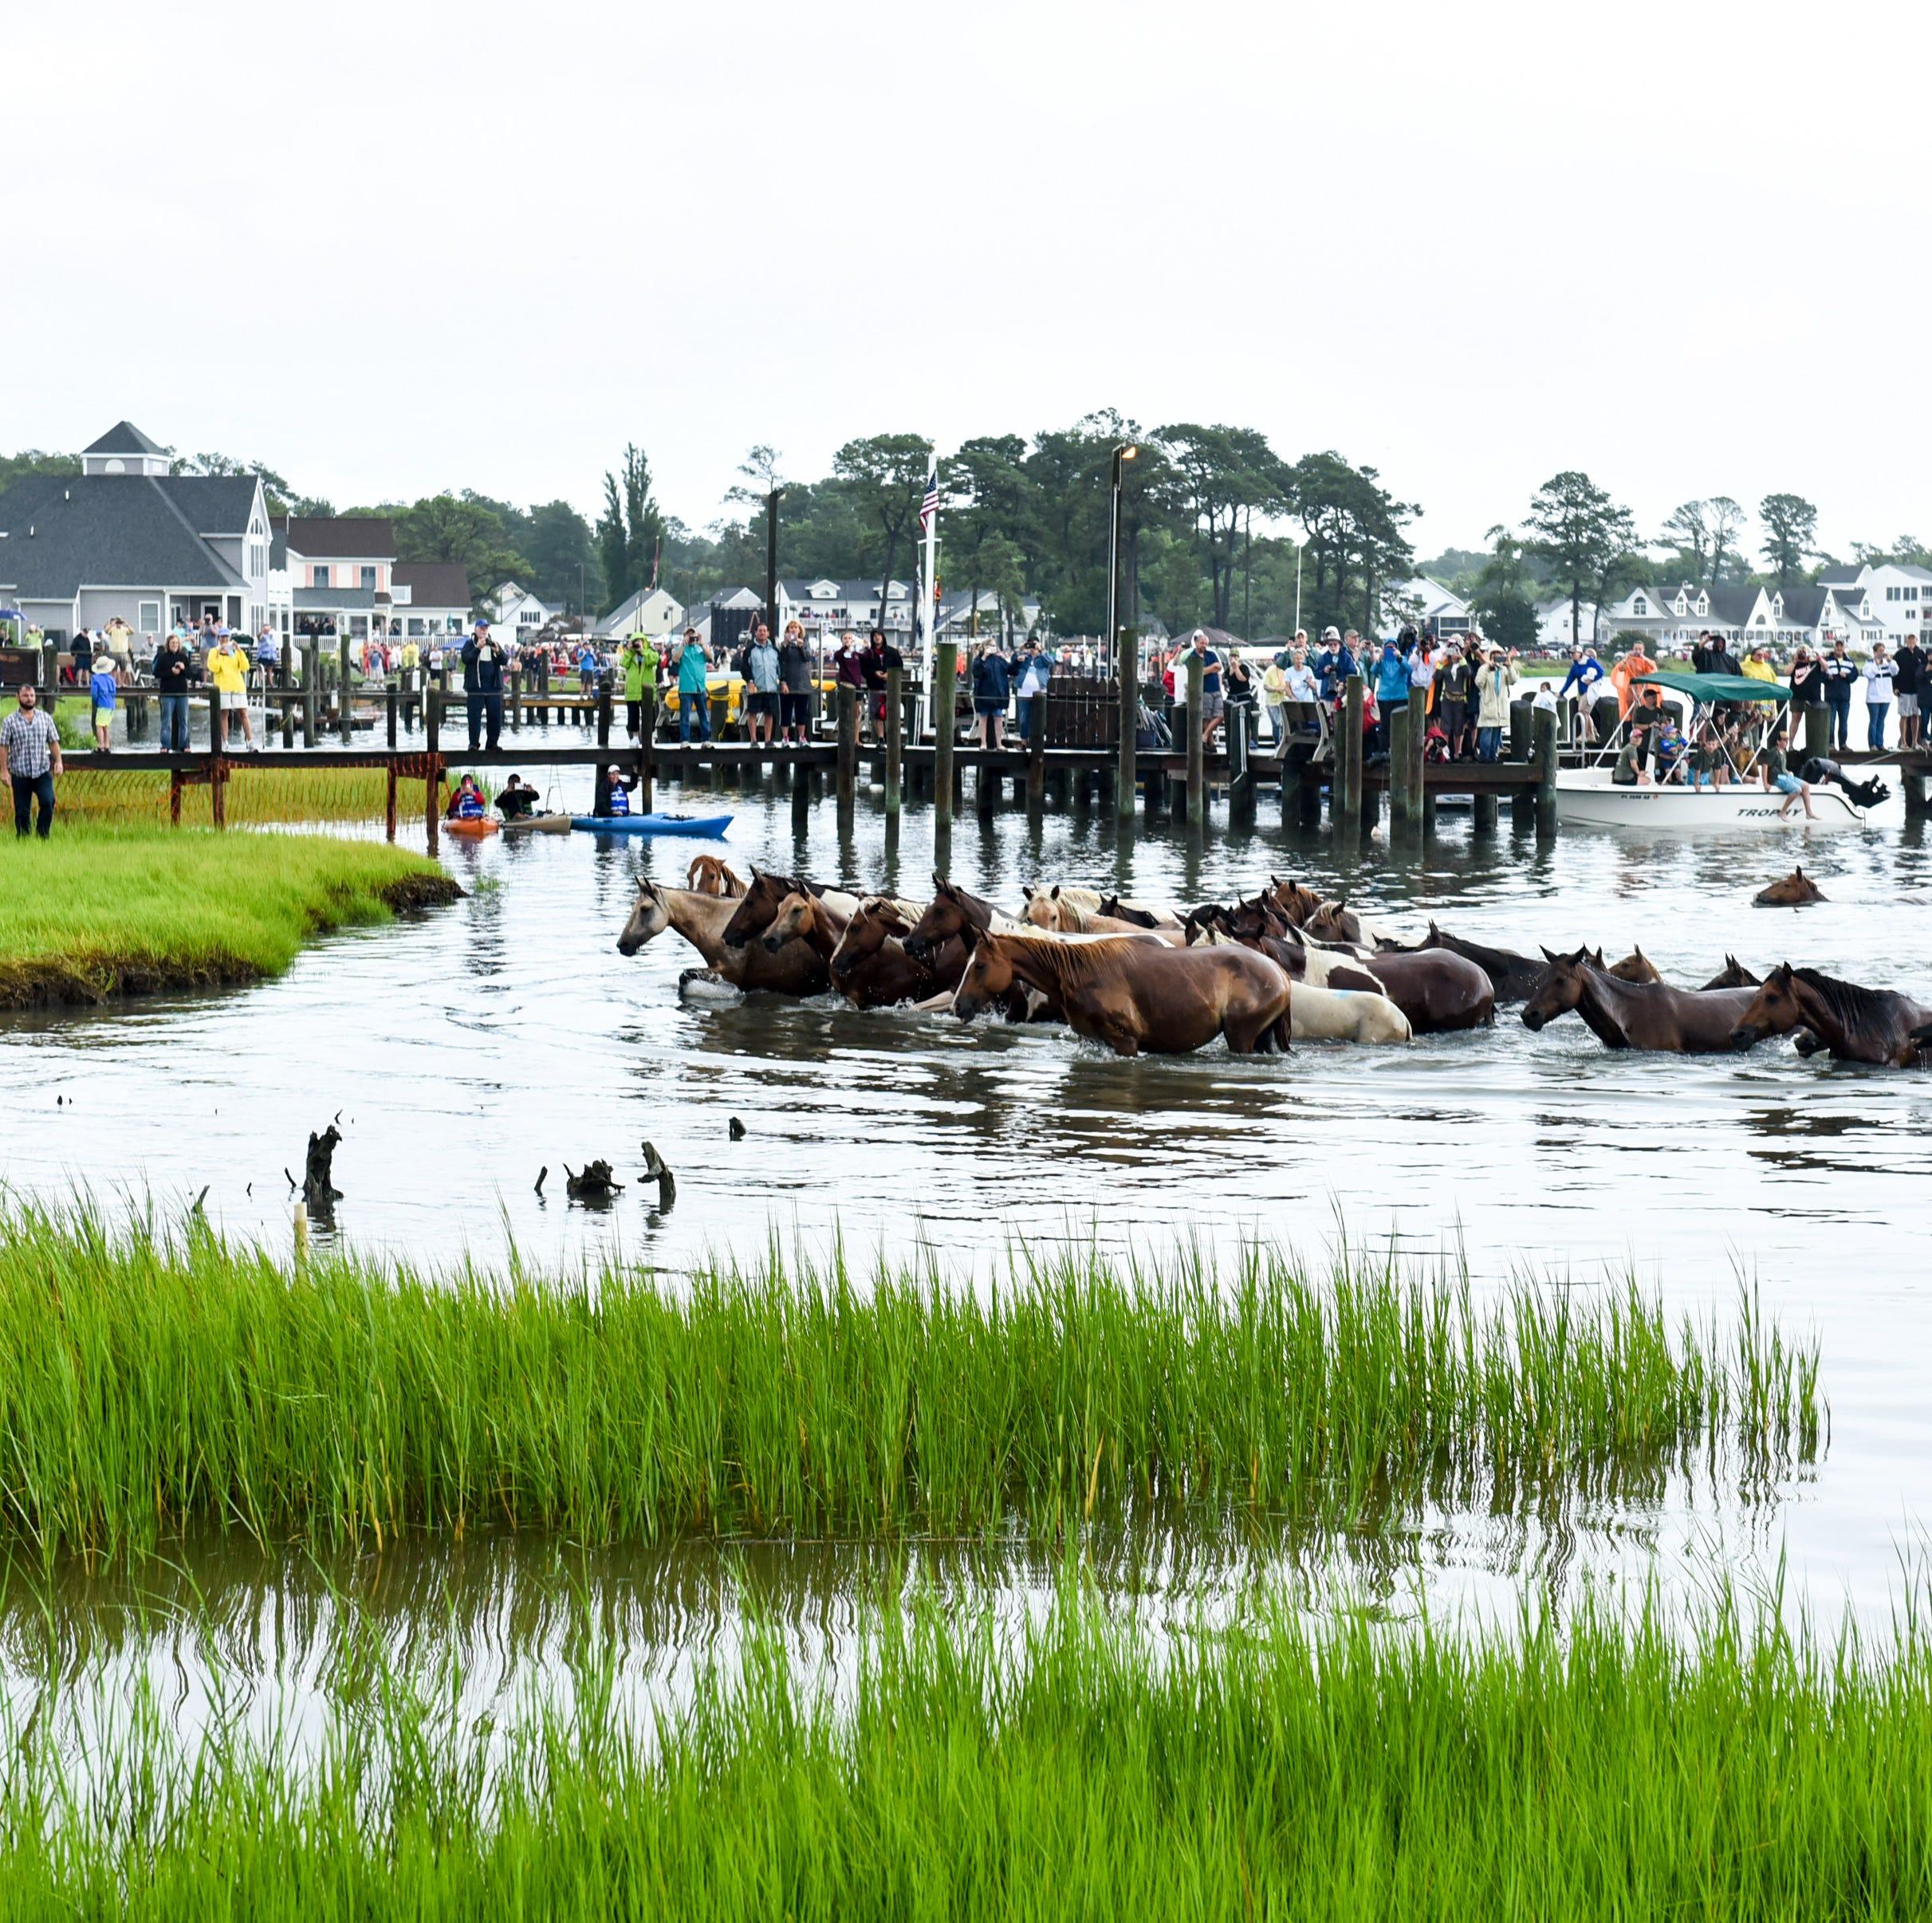 Hurricane Florence: What Chincoteague, Assateague do to keep ponies safe